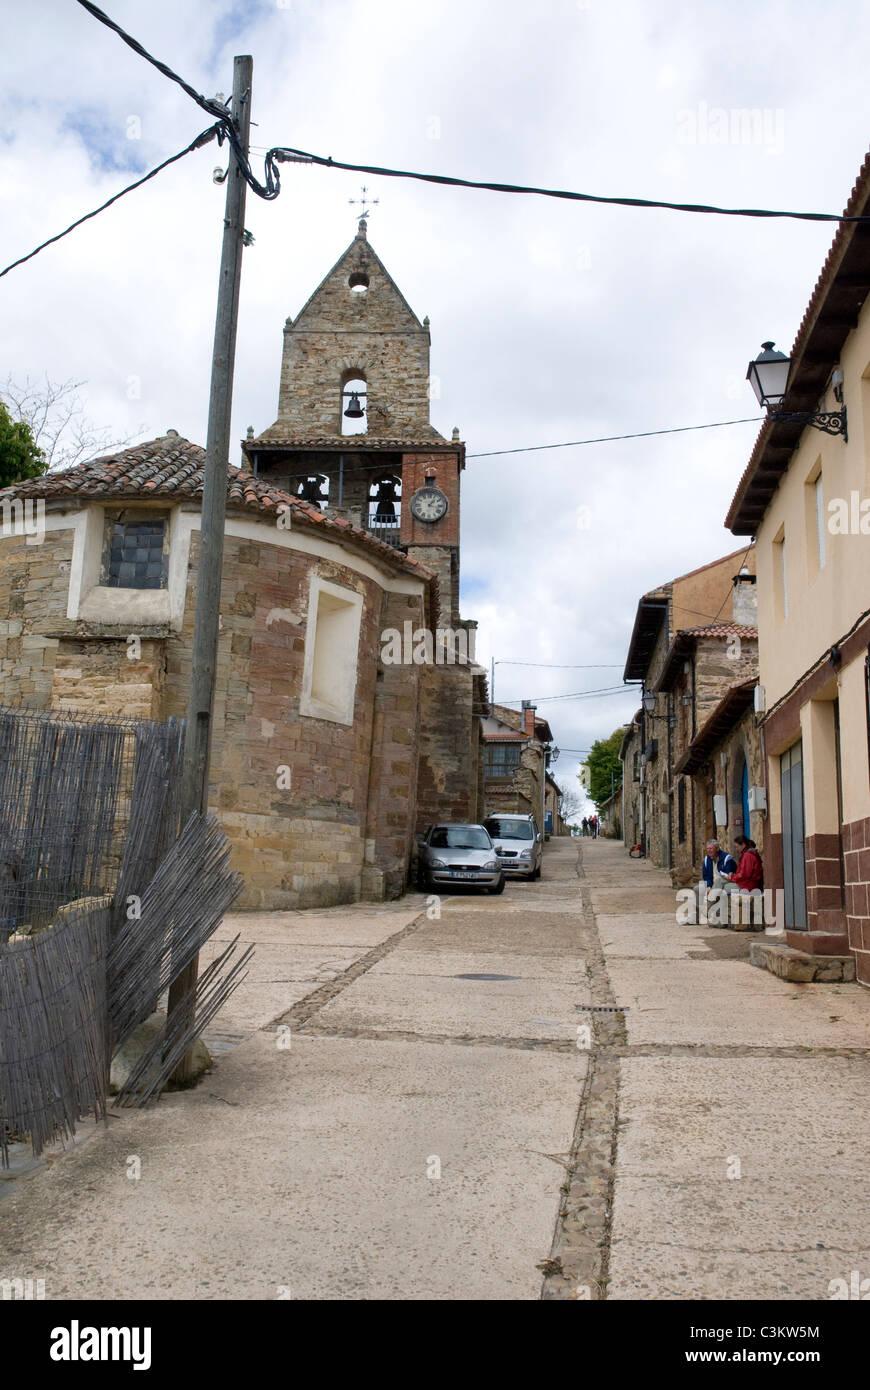 Rural village along the pilgrimage route, Camino de Santiago, Northern Spain - Stock Image